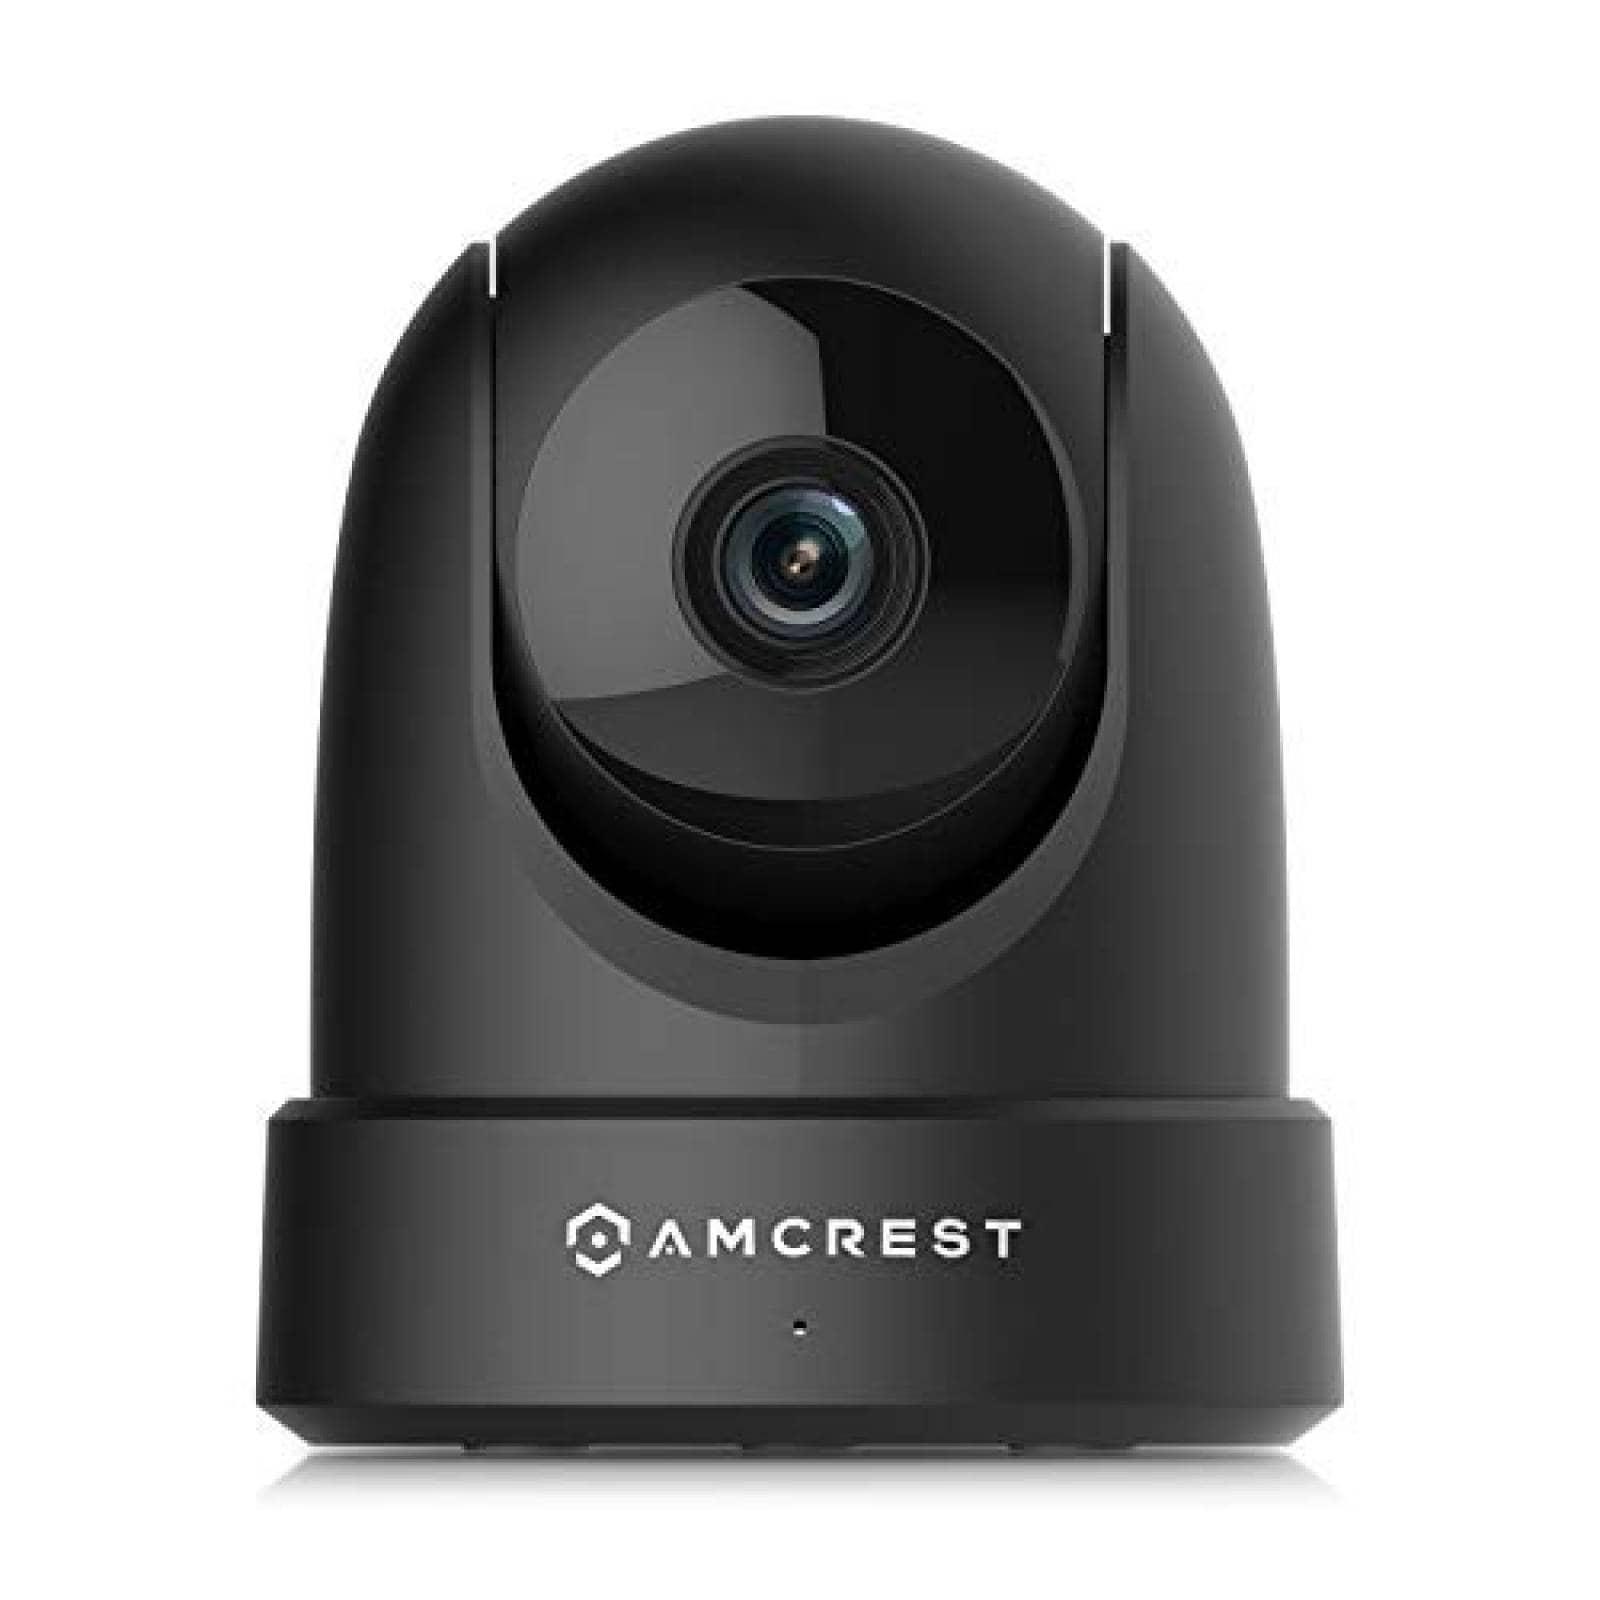 Cámara de vigilancia Amcrest 4MP WiFi para interior -Negro